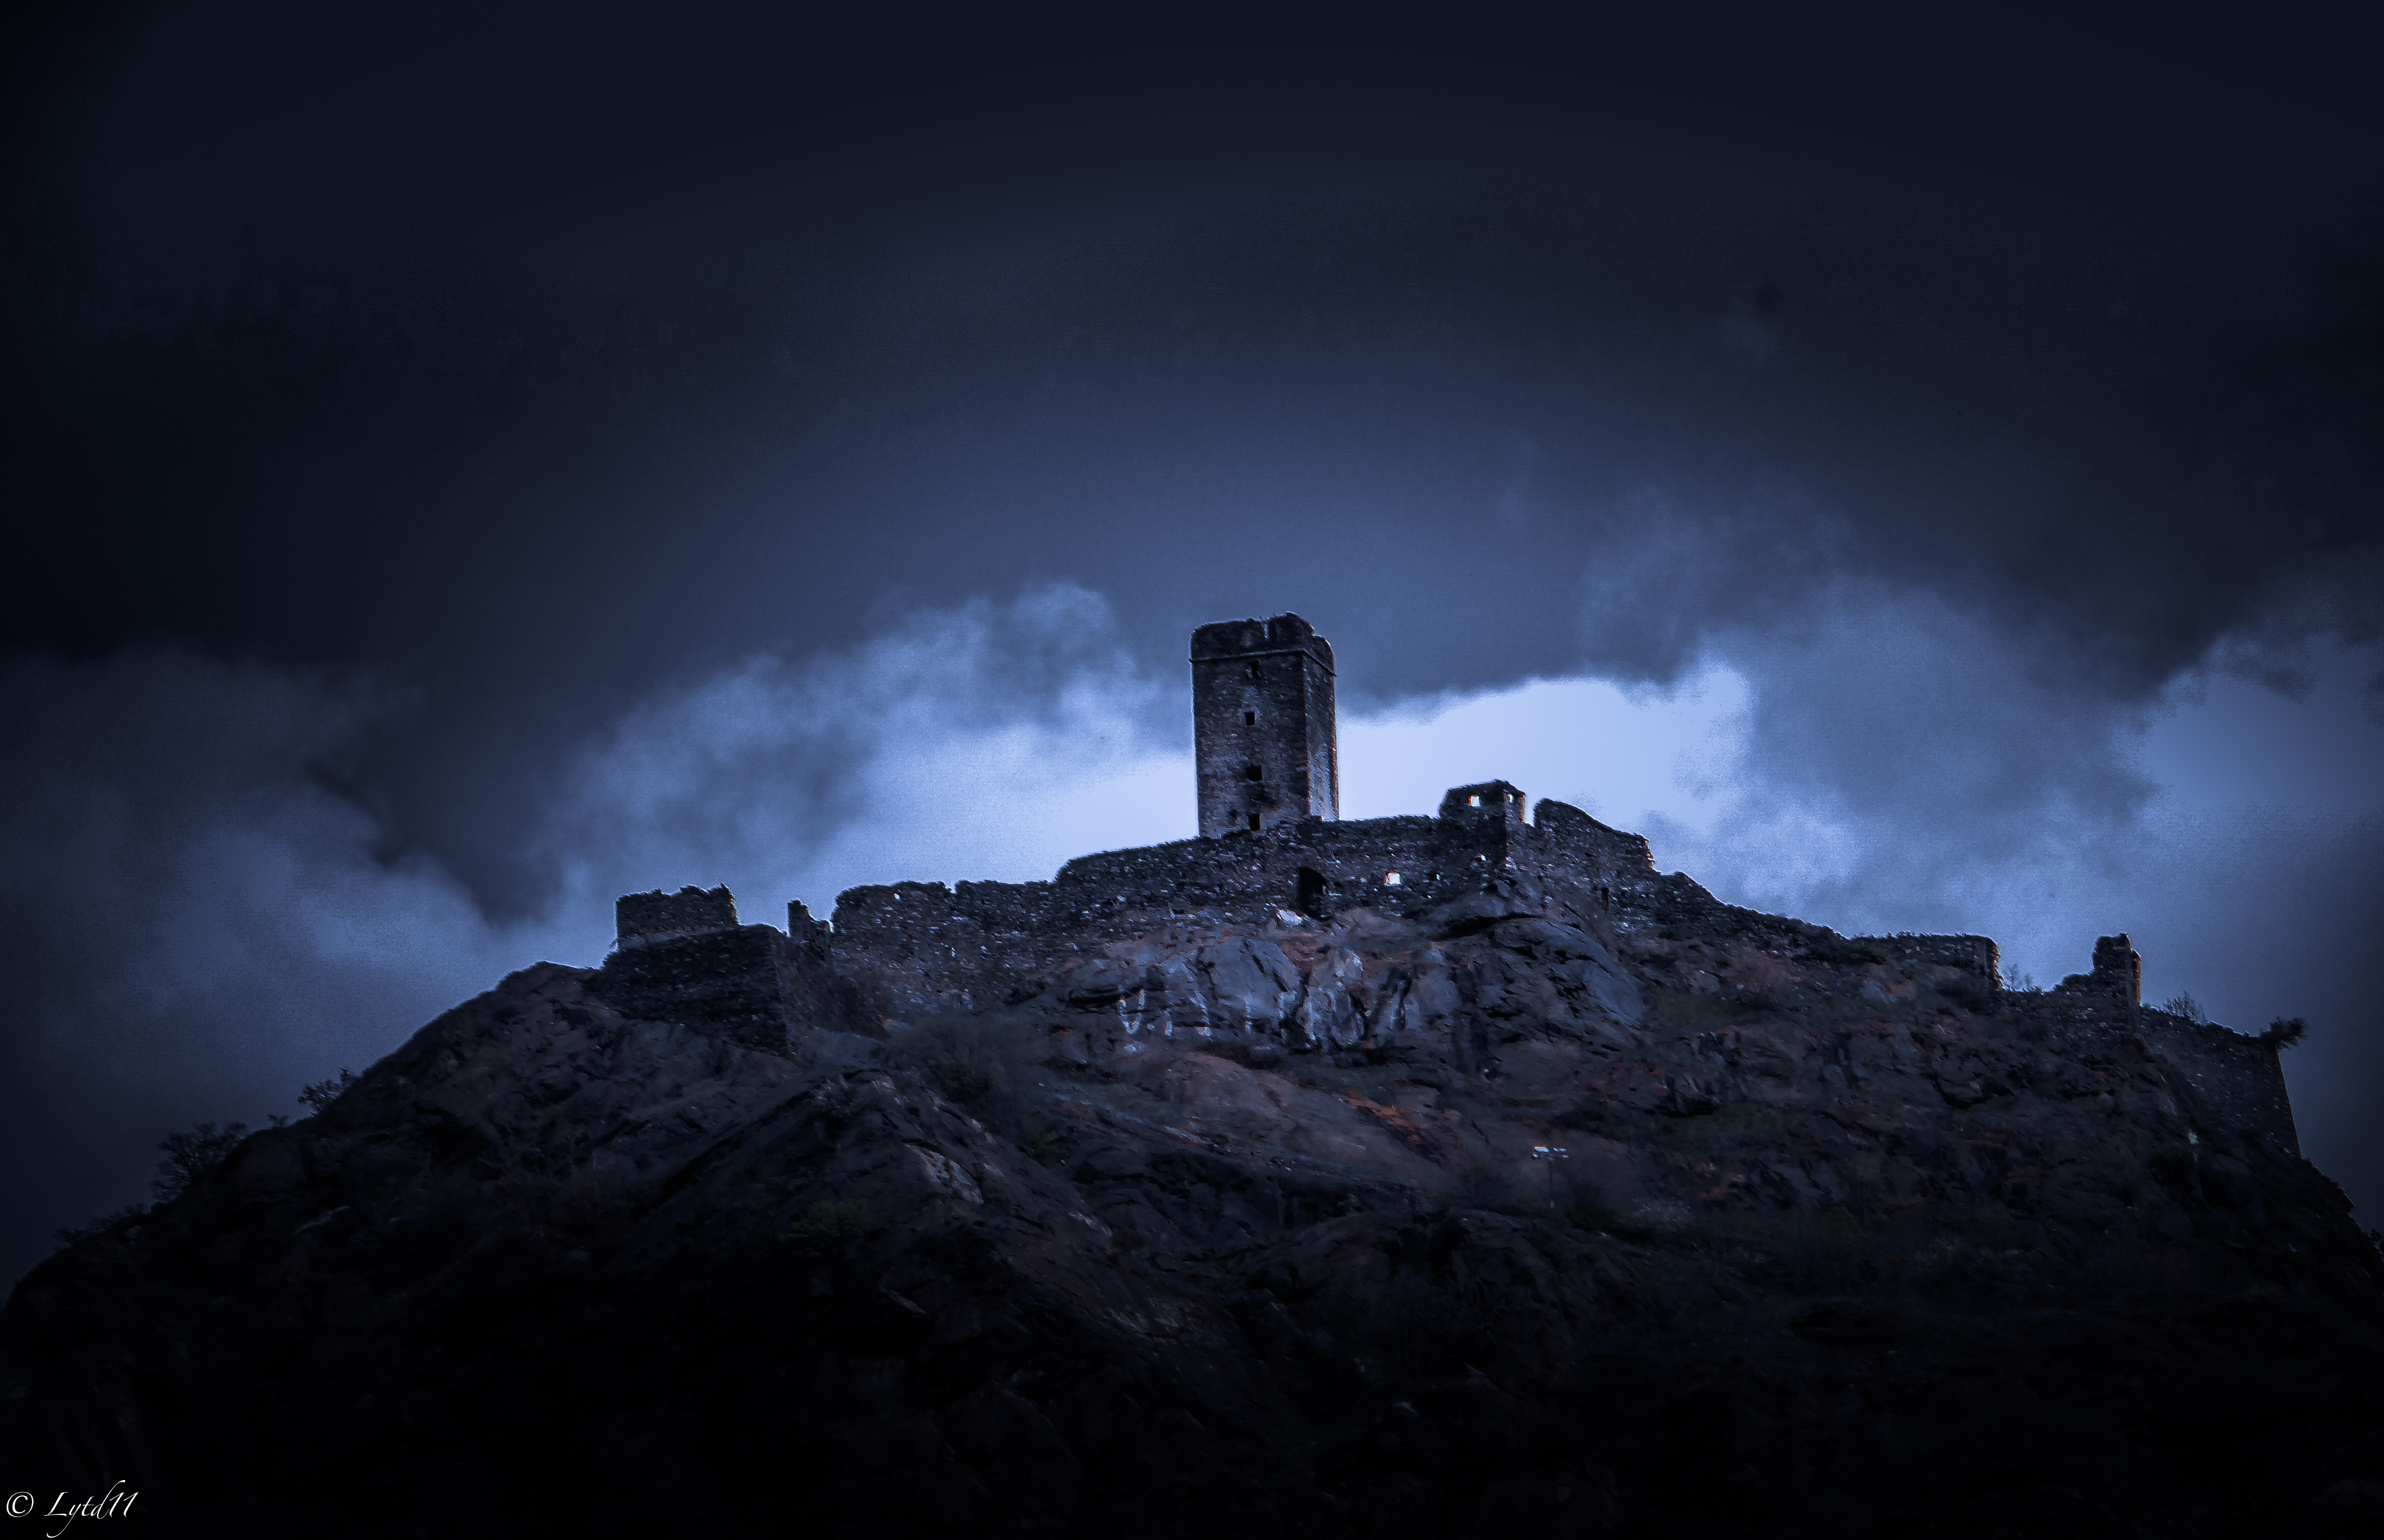 Il castello di Saint-Germain a Montjovet (Foto di Emi Dattolo - LYTD11)